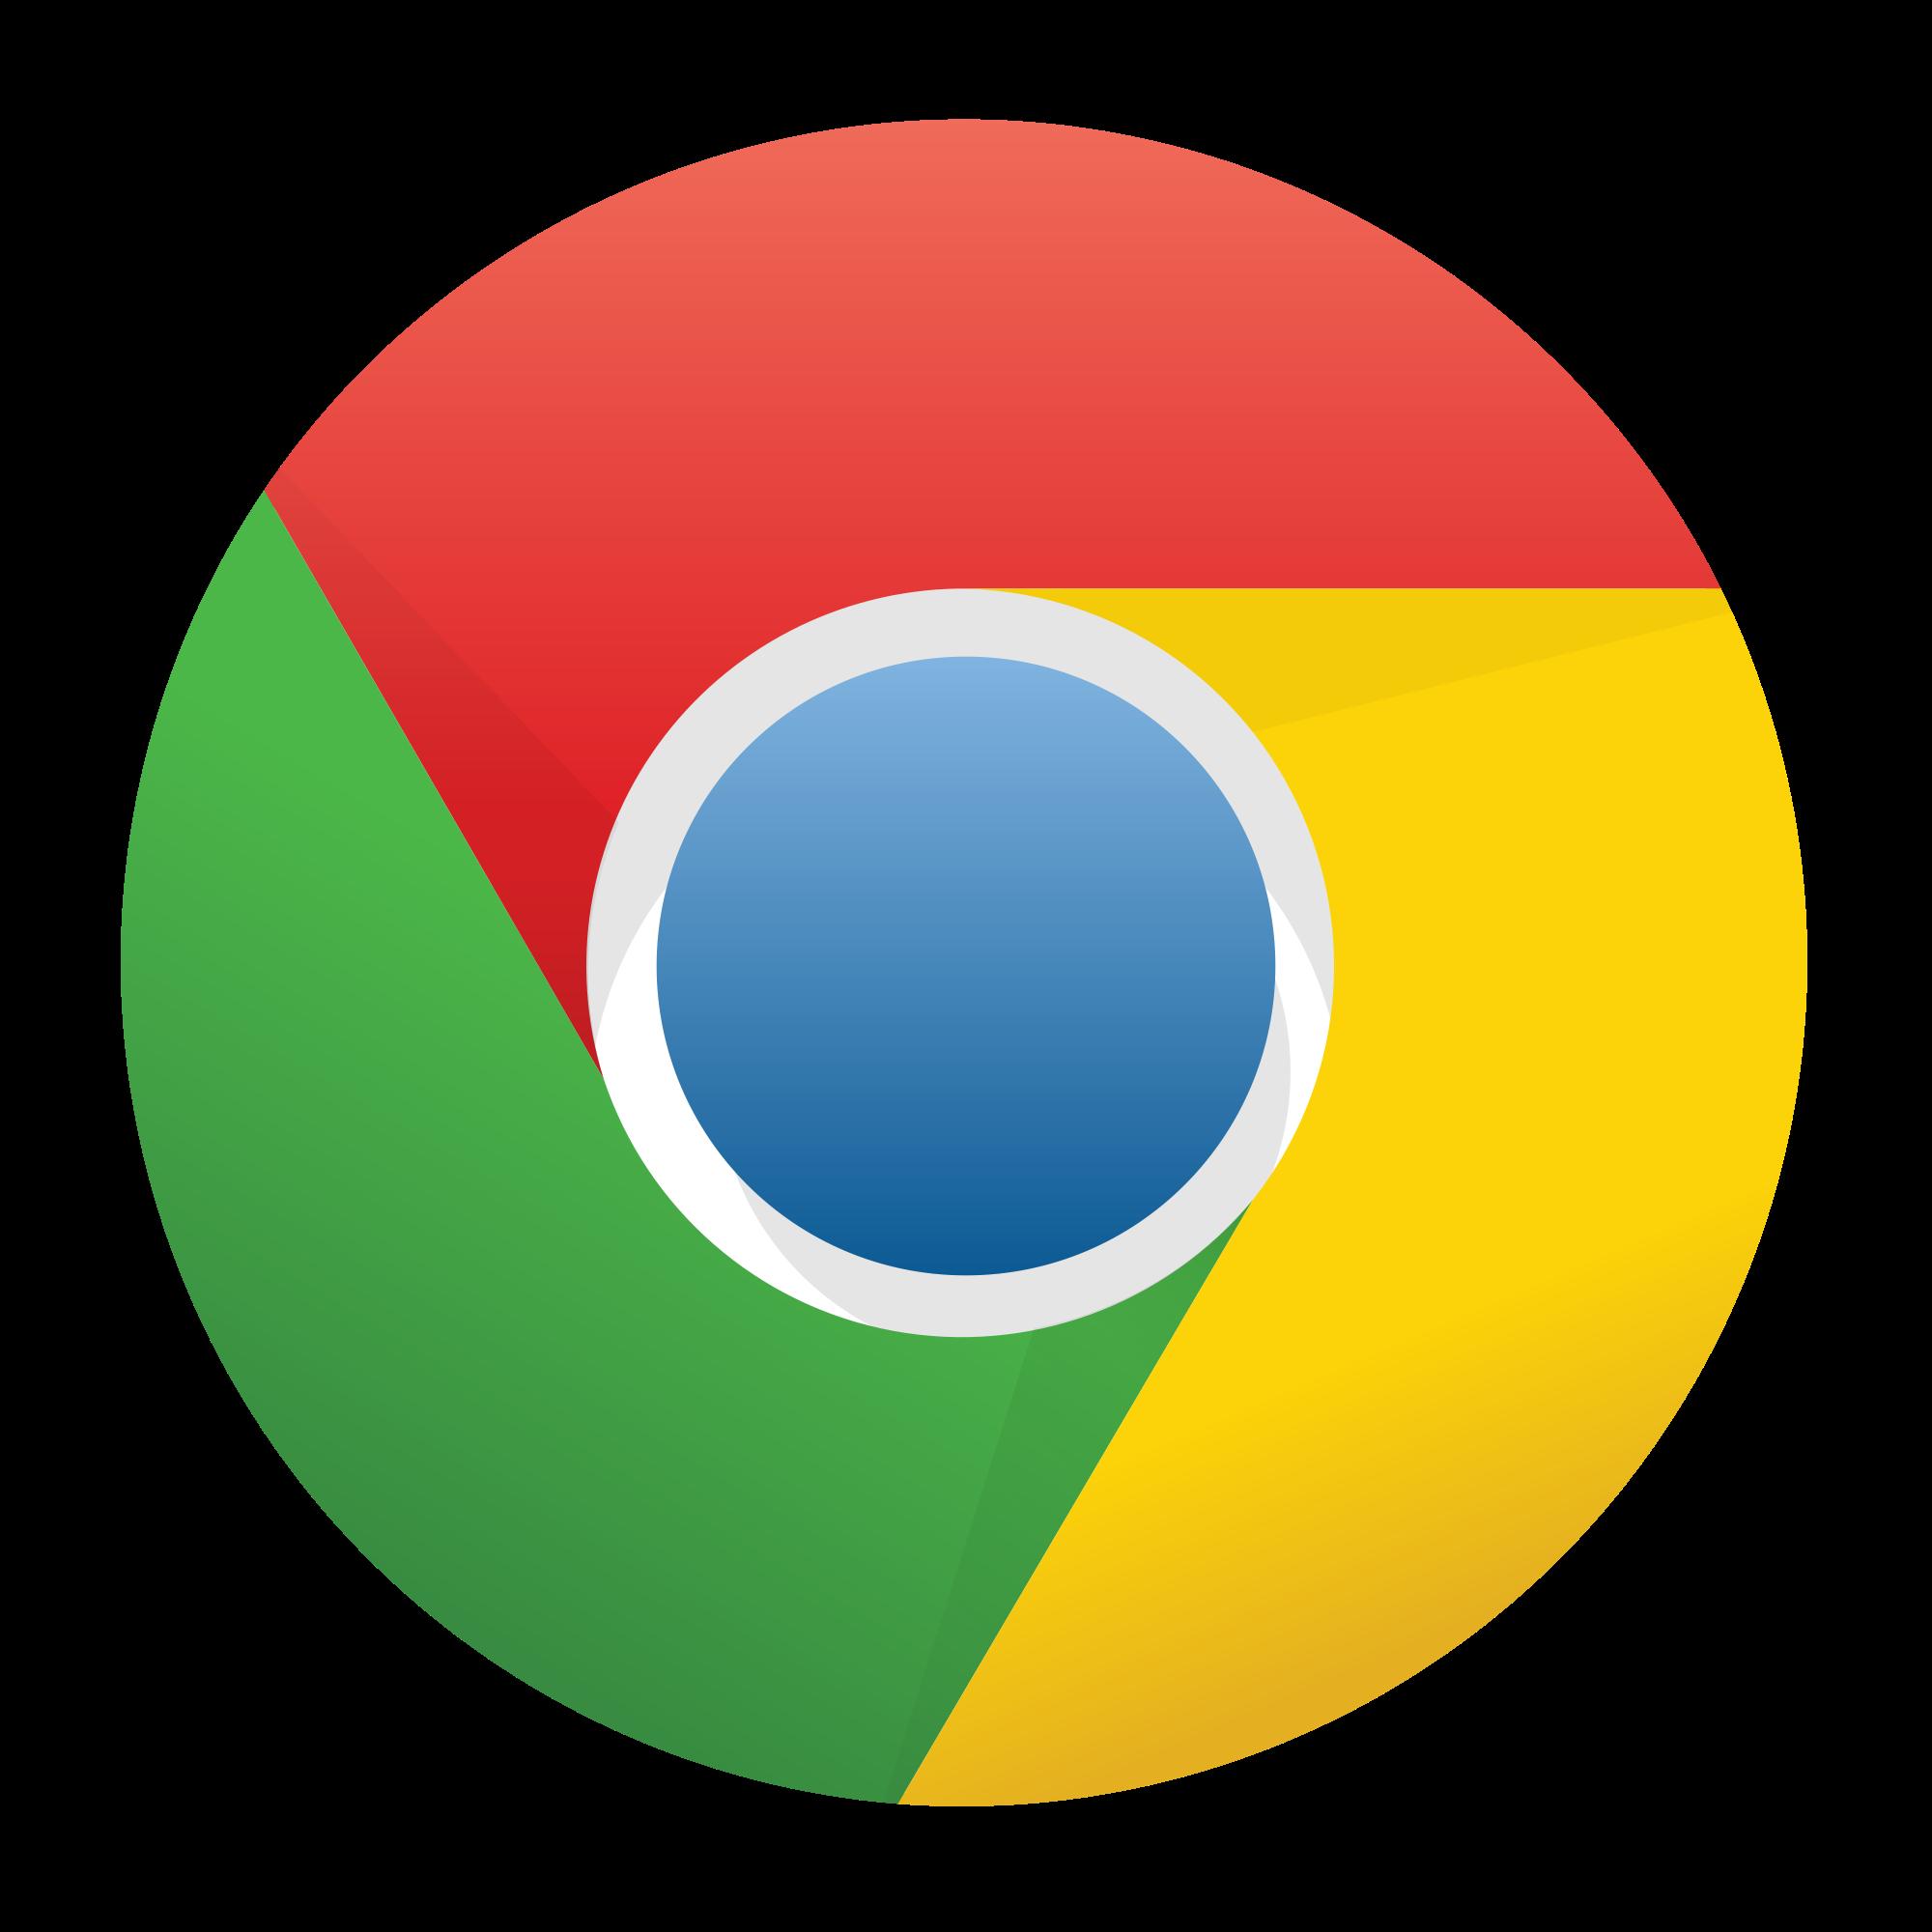 Google clipart logo chrome. Logos images femalecelebrity